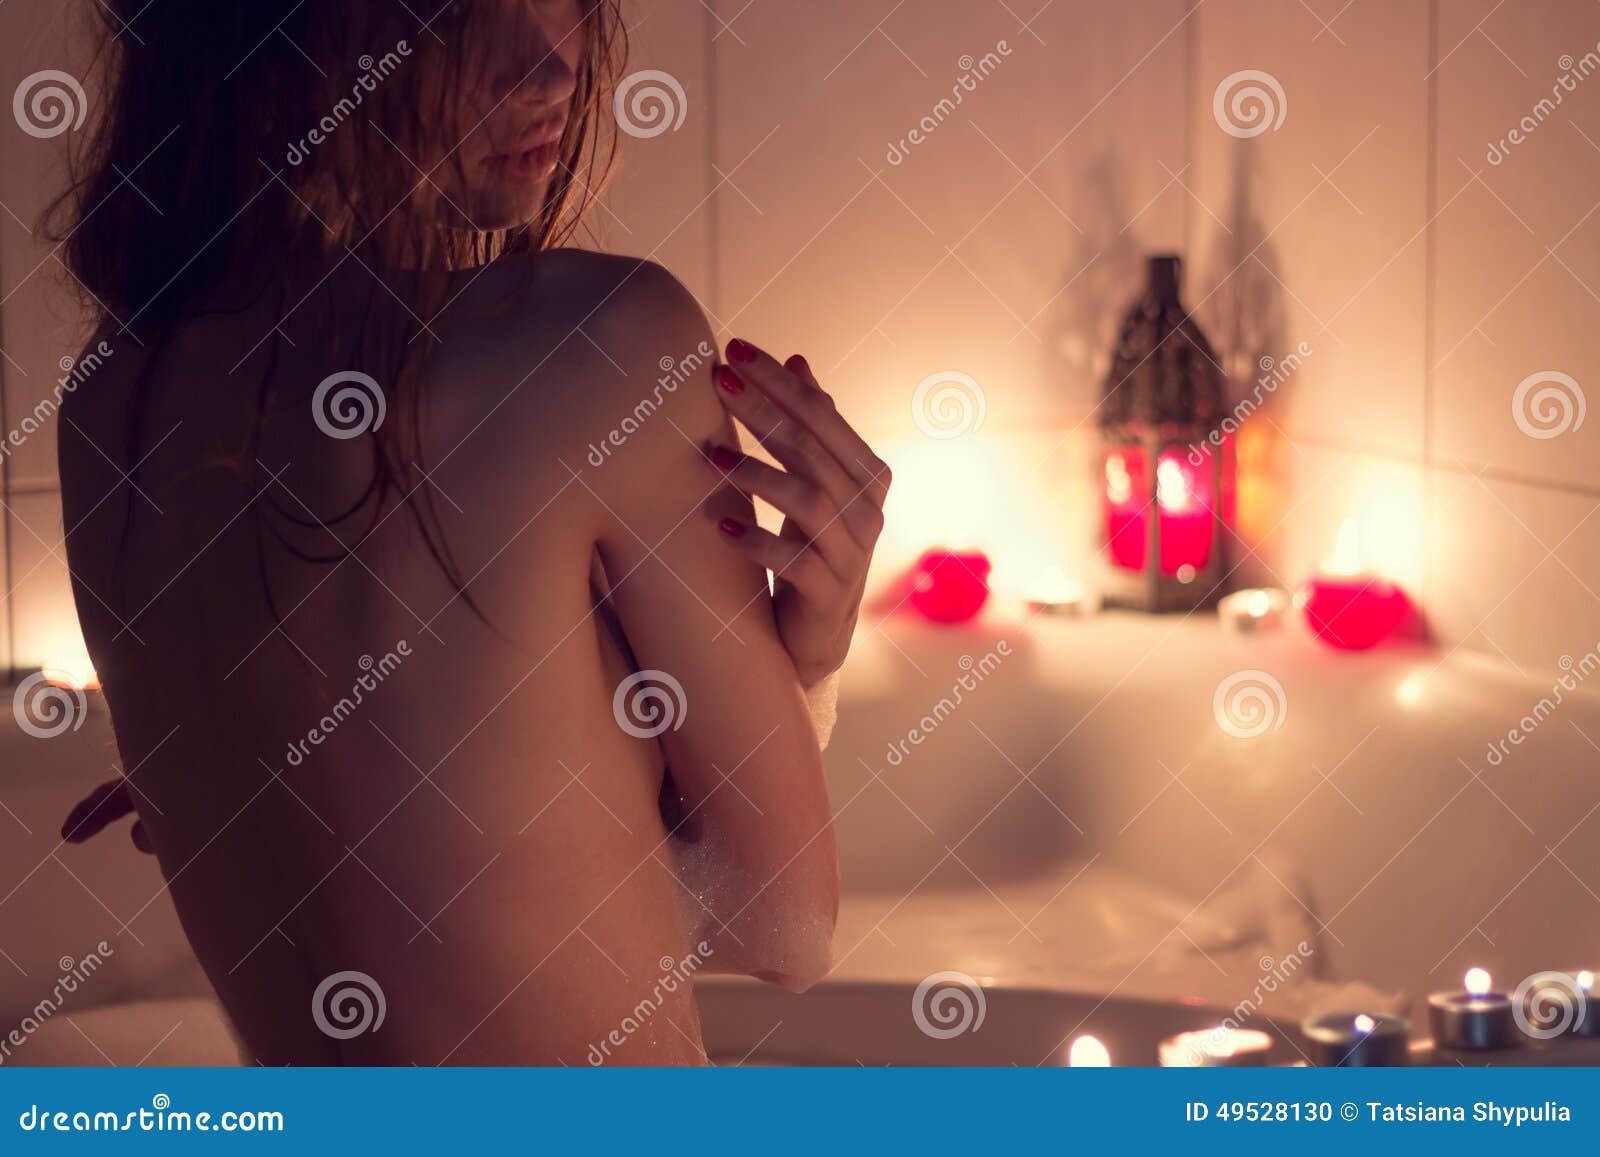 Фото девушки в ванне красивое  фотография